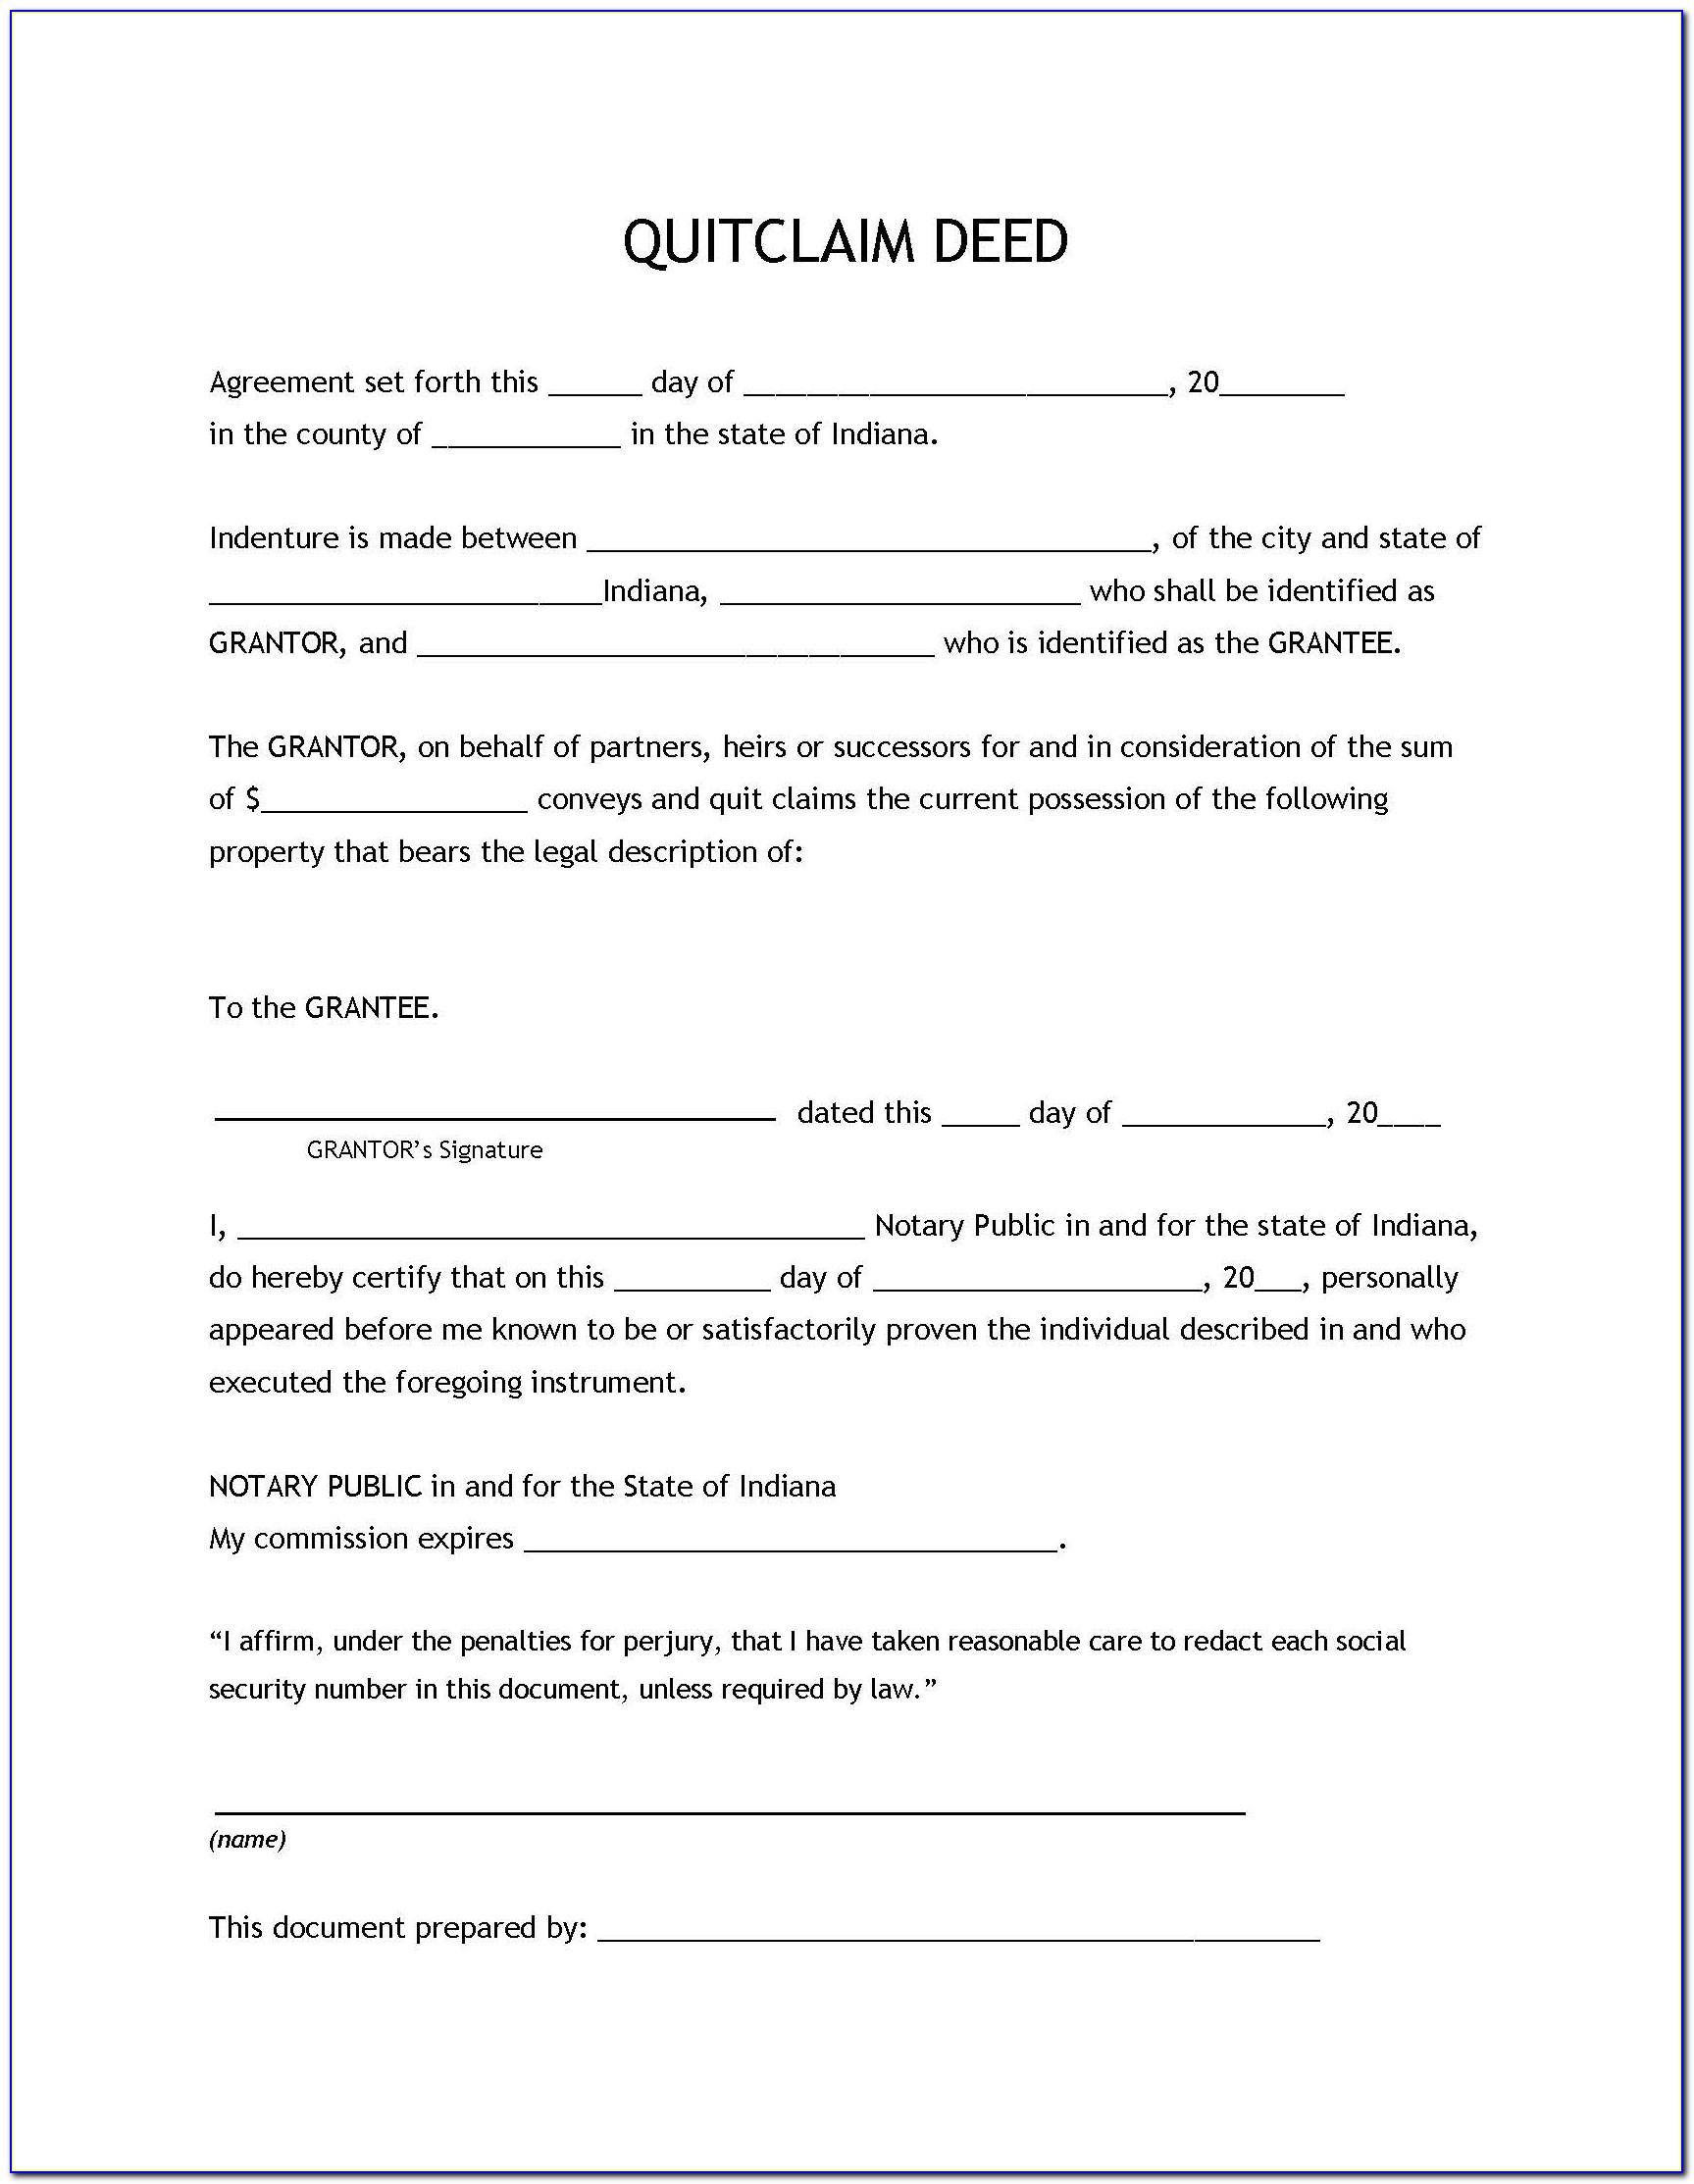 quick claim deed form georgia  Quit Claim Deed Form Forsyth County Georgia - Form : Resume ...